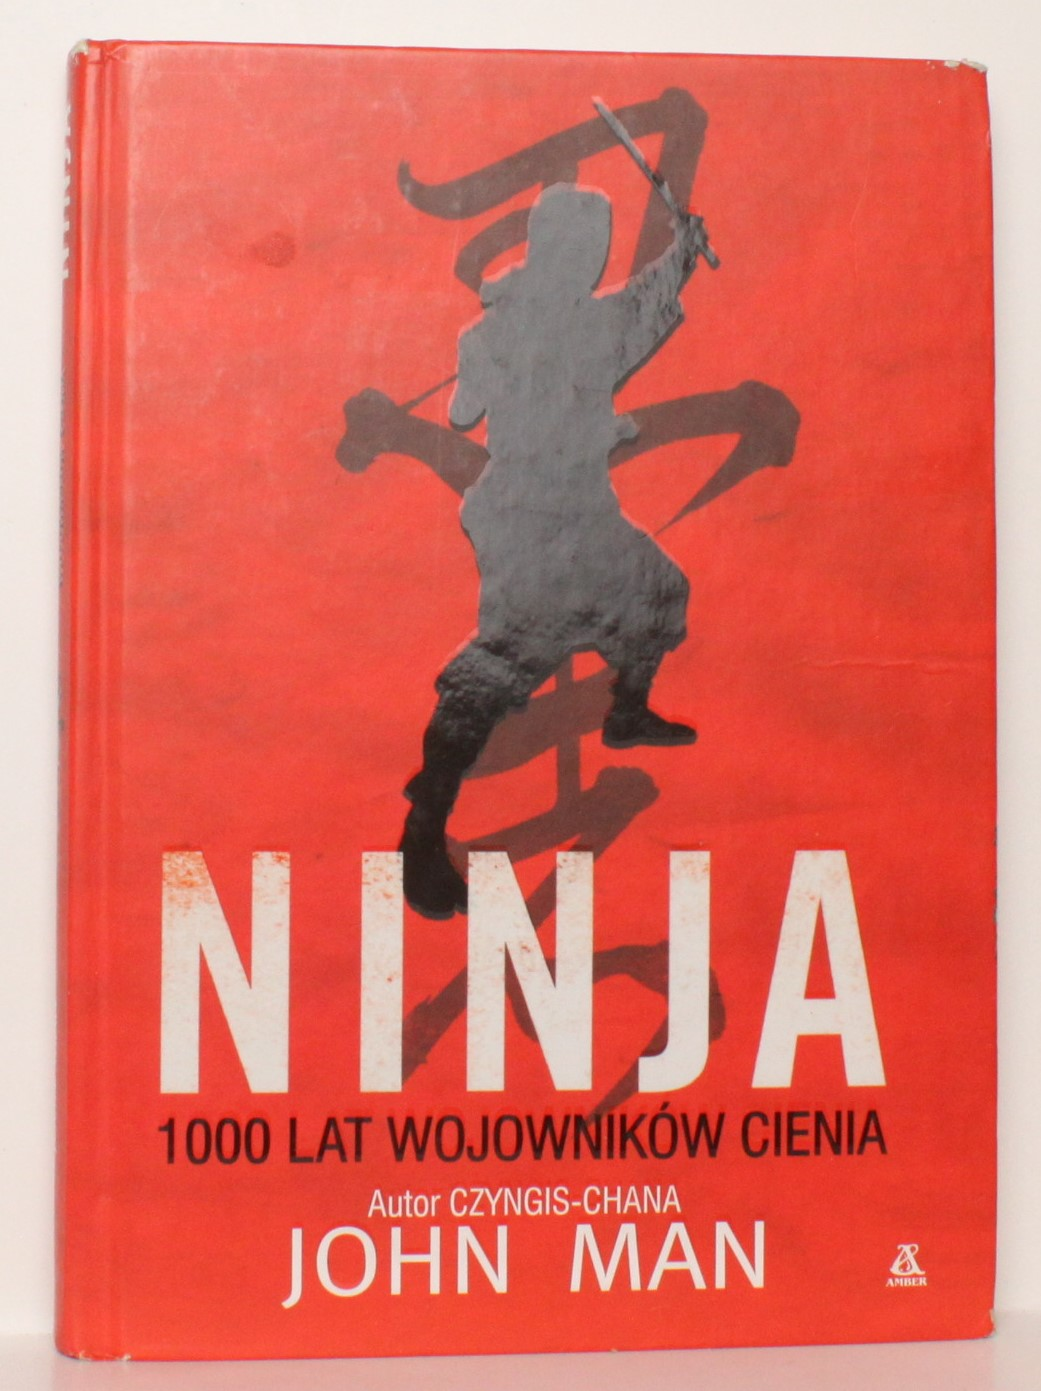 NINJA 1000 LAT WOJOWNIKÓW CIENIA - JOHN MAN